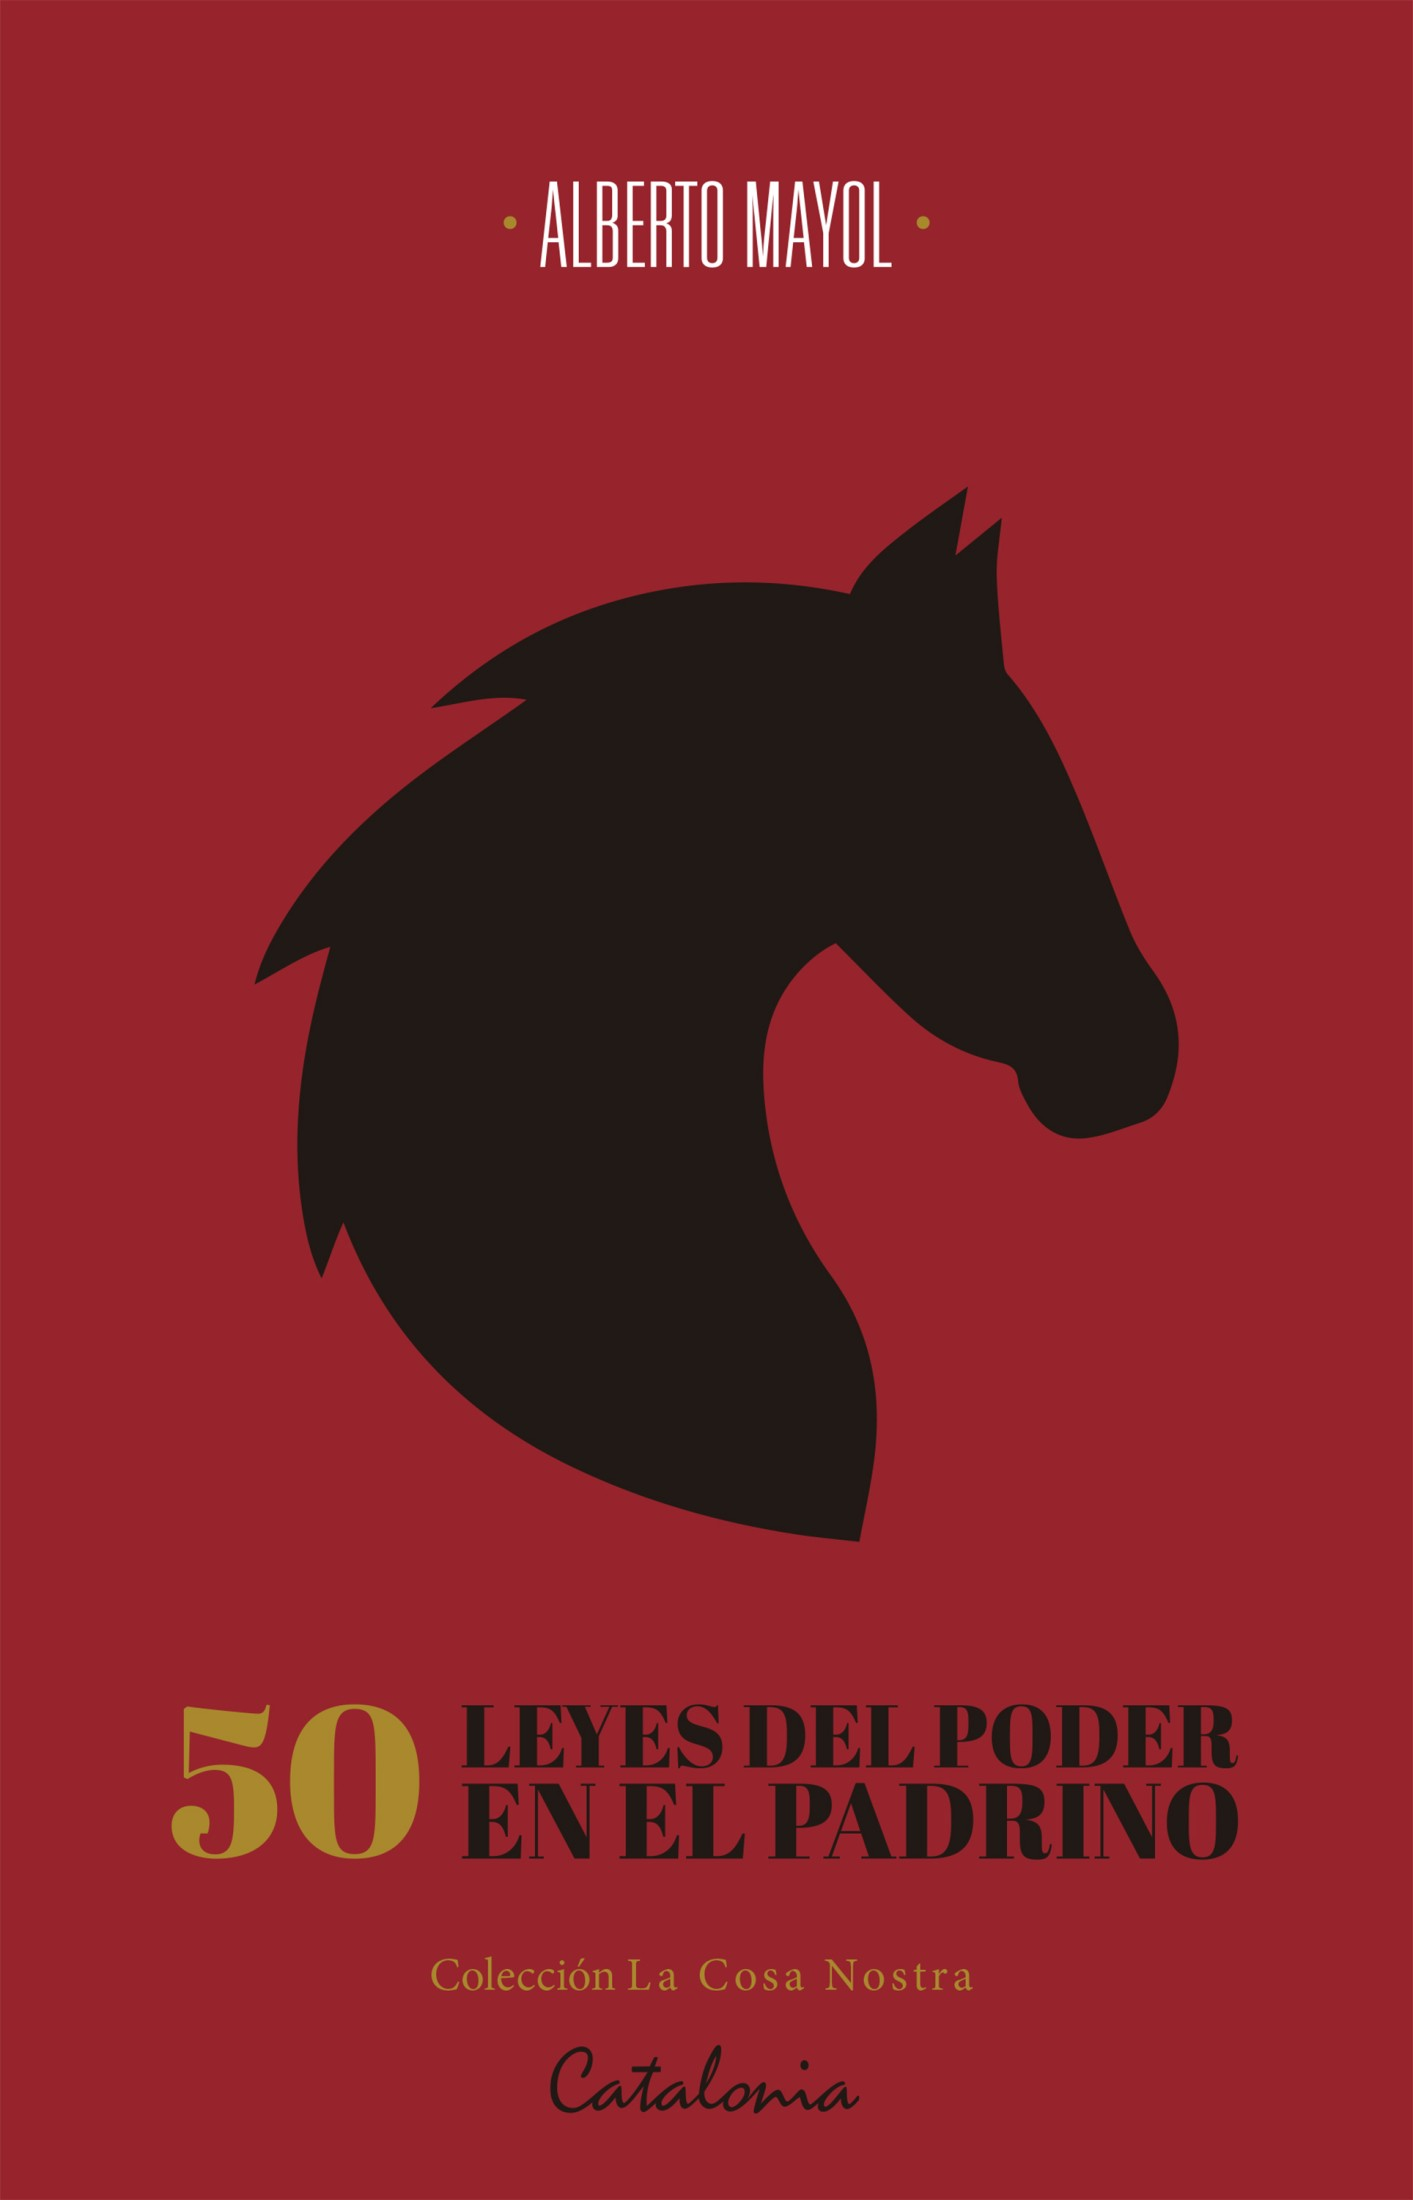 50 leyes del poder en El Padrino: De Maquiavelo a Coppola a través de Puzo